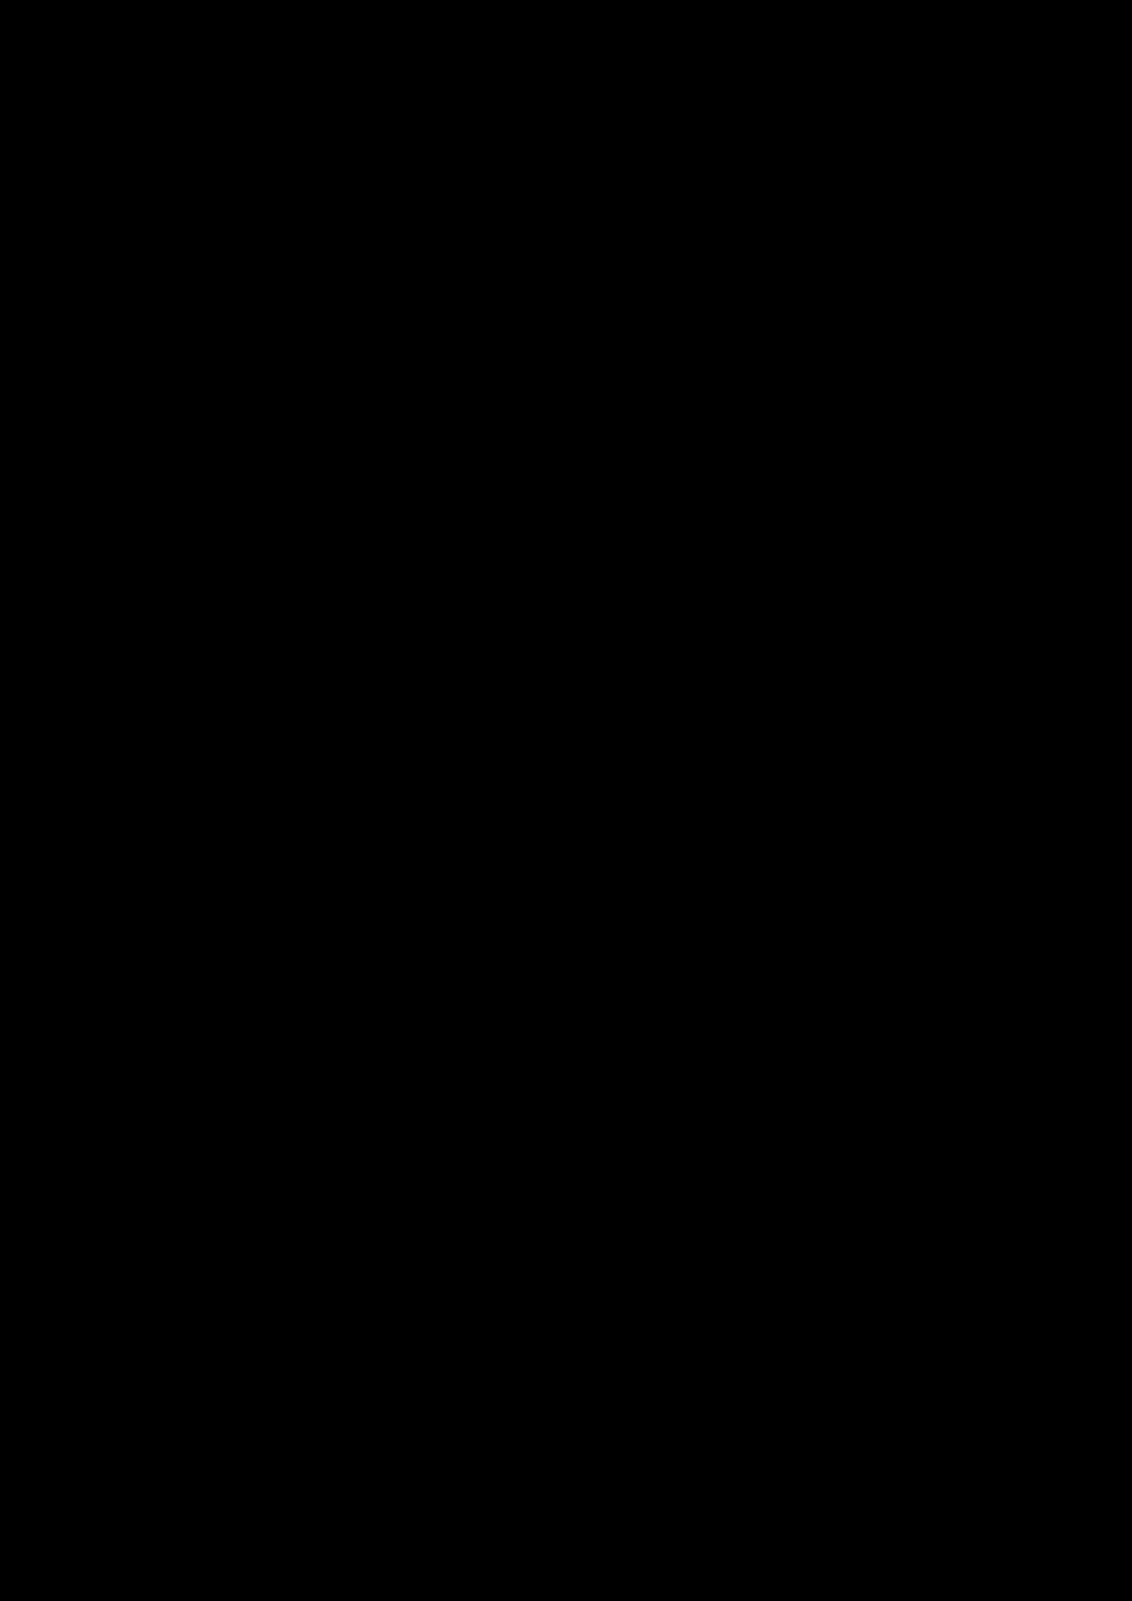 Belyiy sokol slide, Image 181